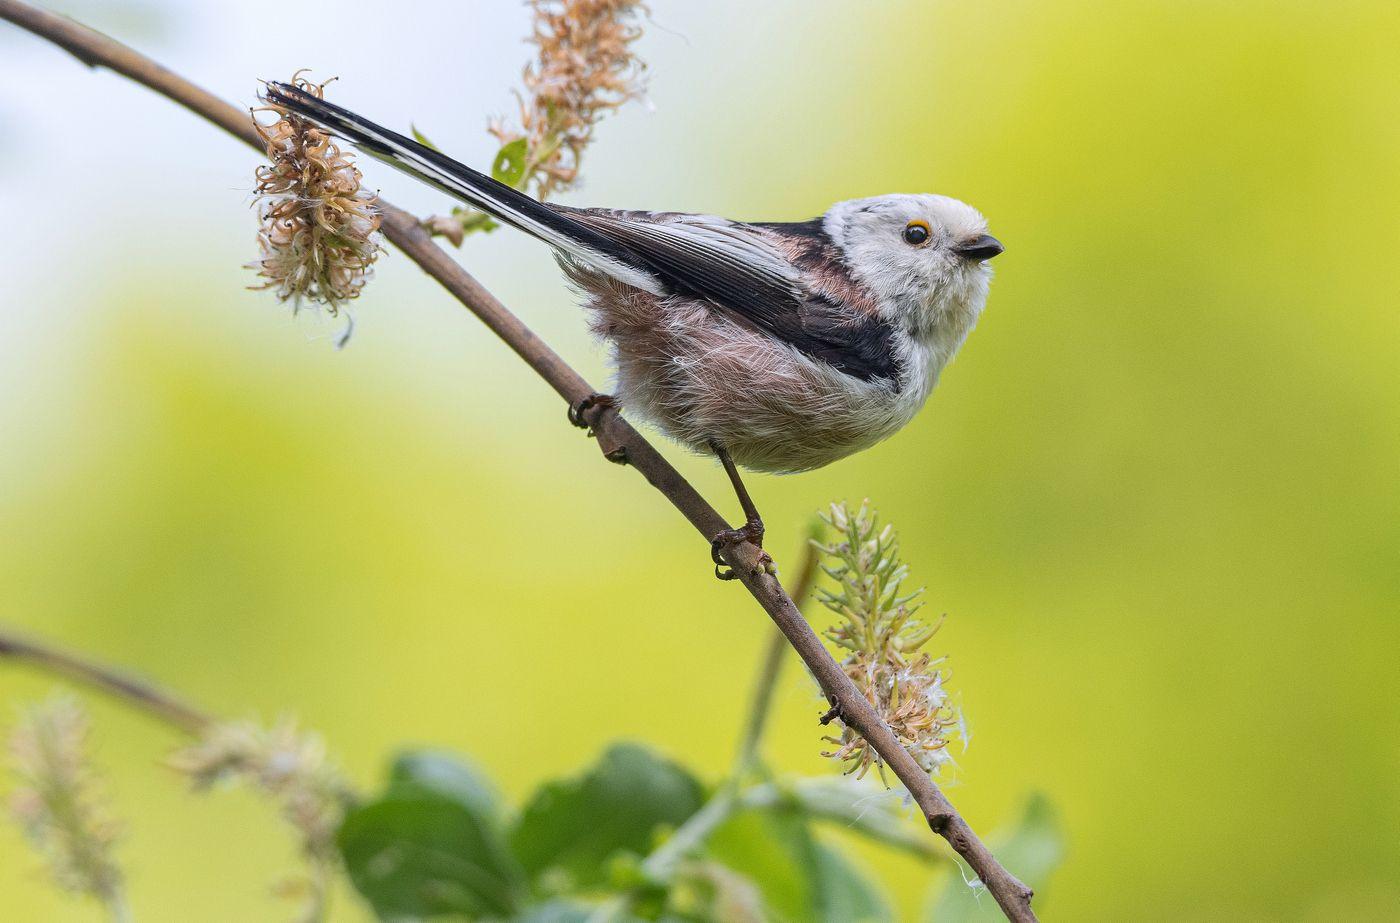 птица длиннохвостая синица ополовник, Сигушин Руслан